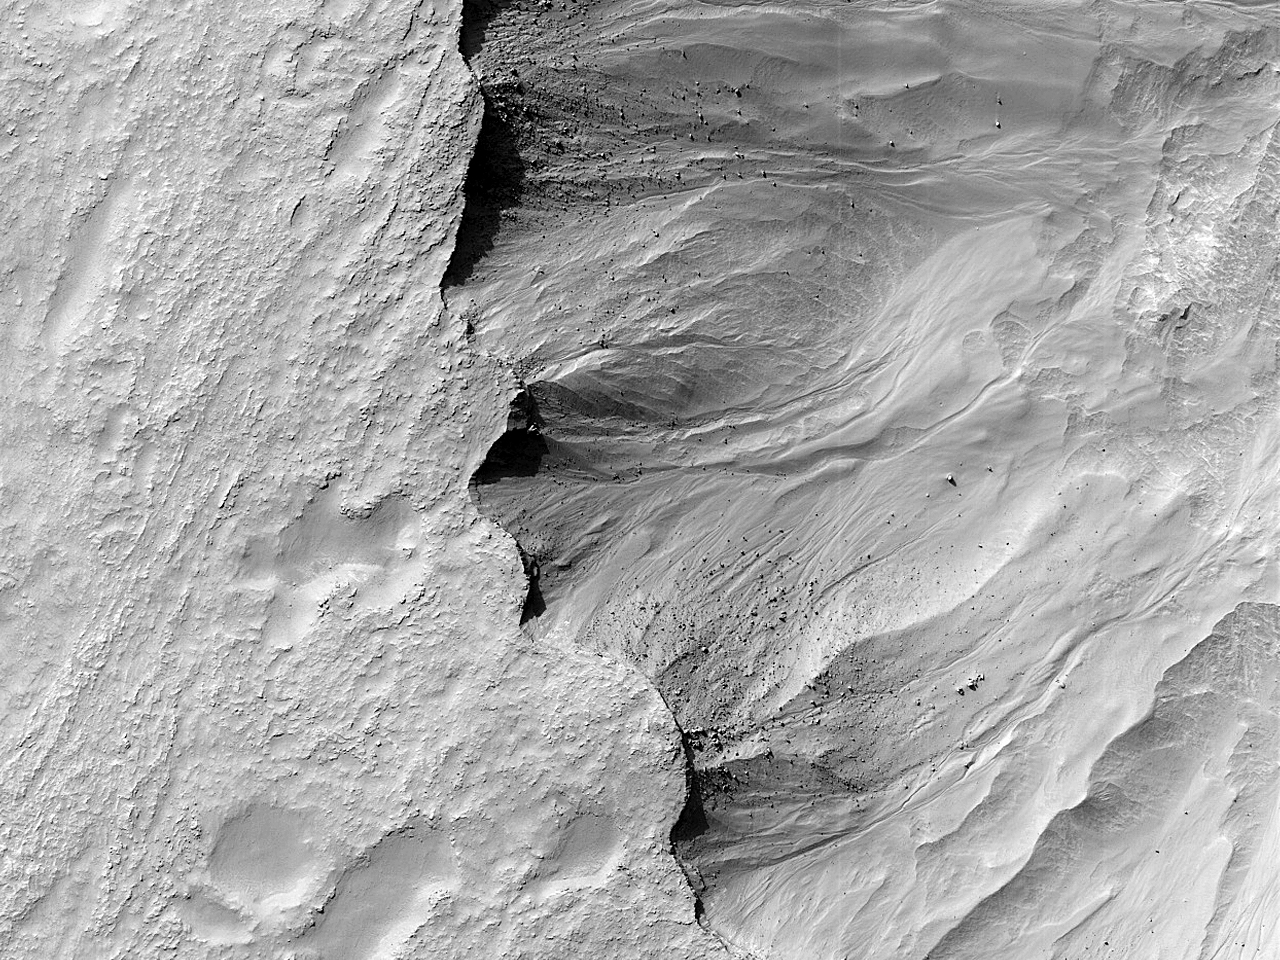 Овраги на крутых склонах плато